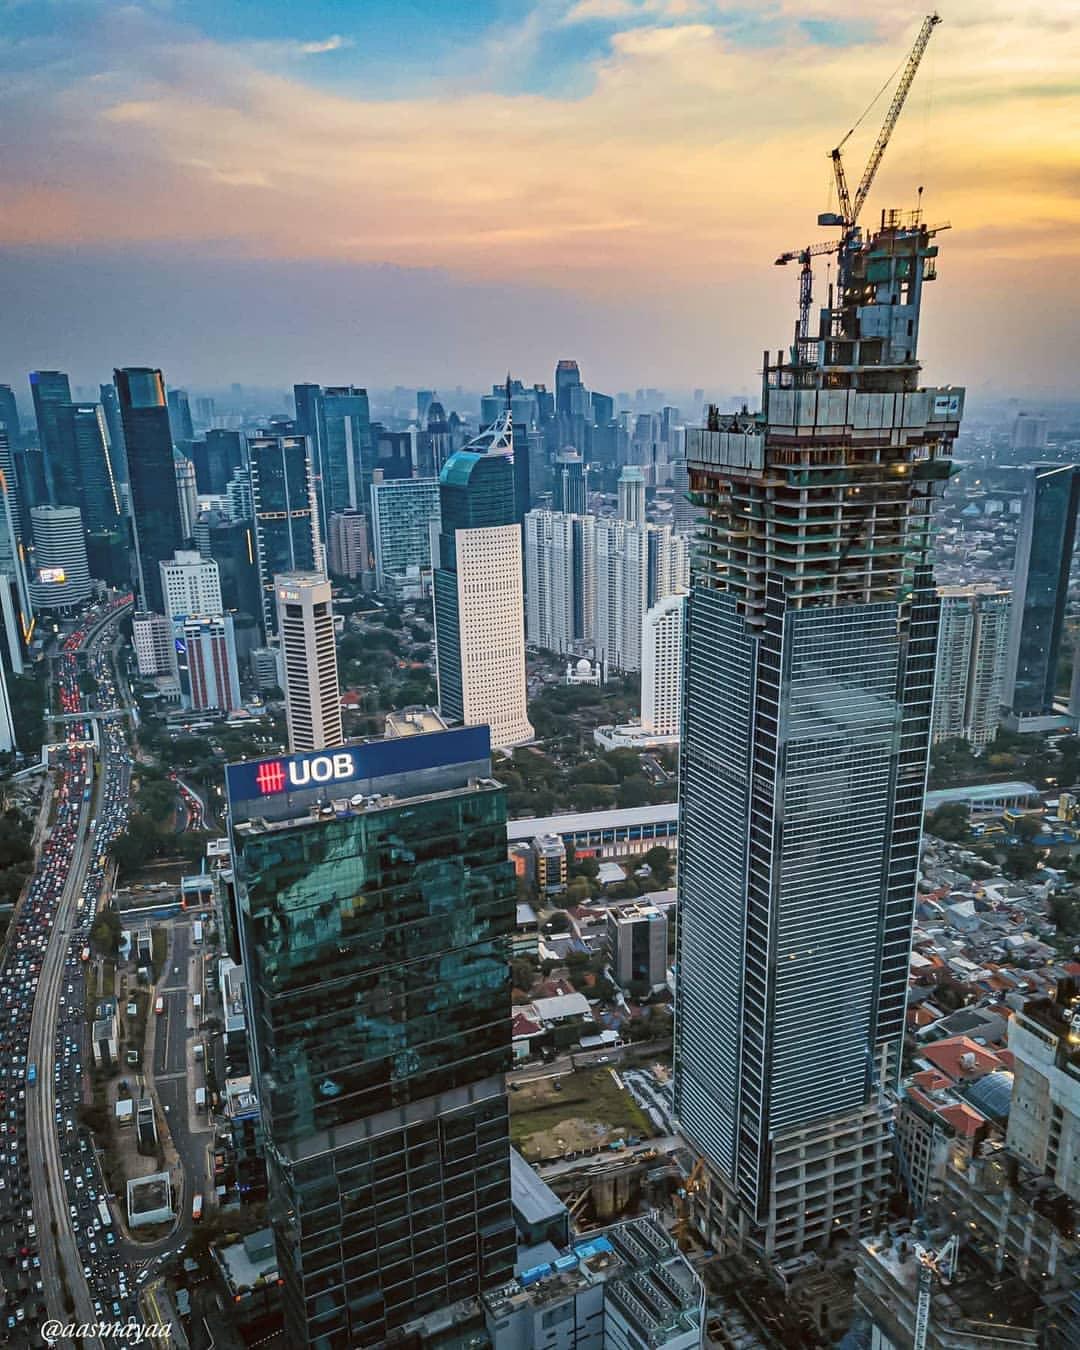 Gedung Tinggi Dari Atas : gedung, tinggi, Mencatat, Pencakar, Langit, Jakarta, Afandri